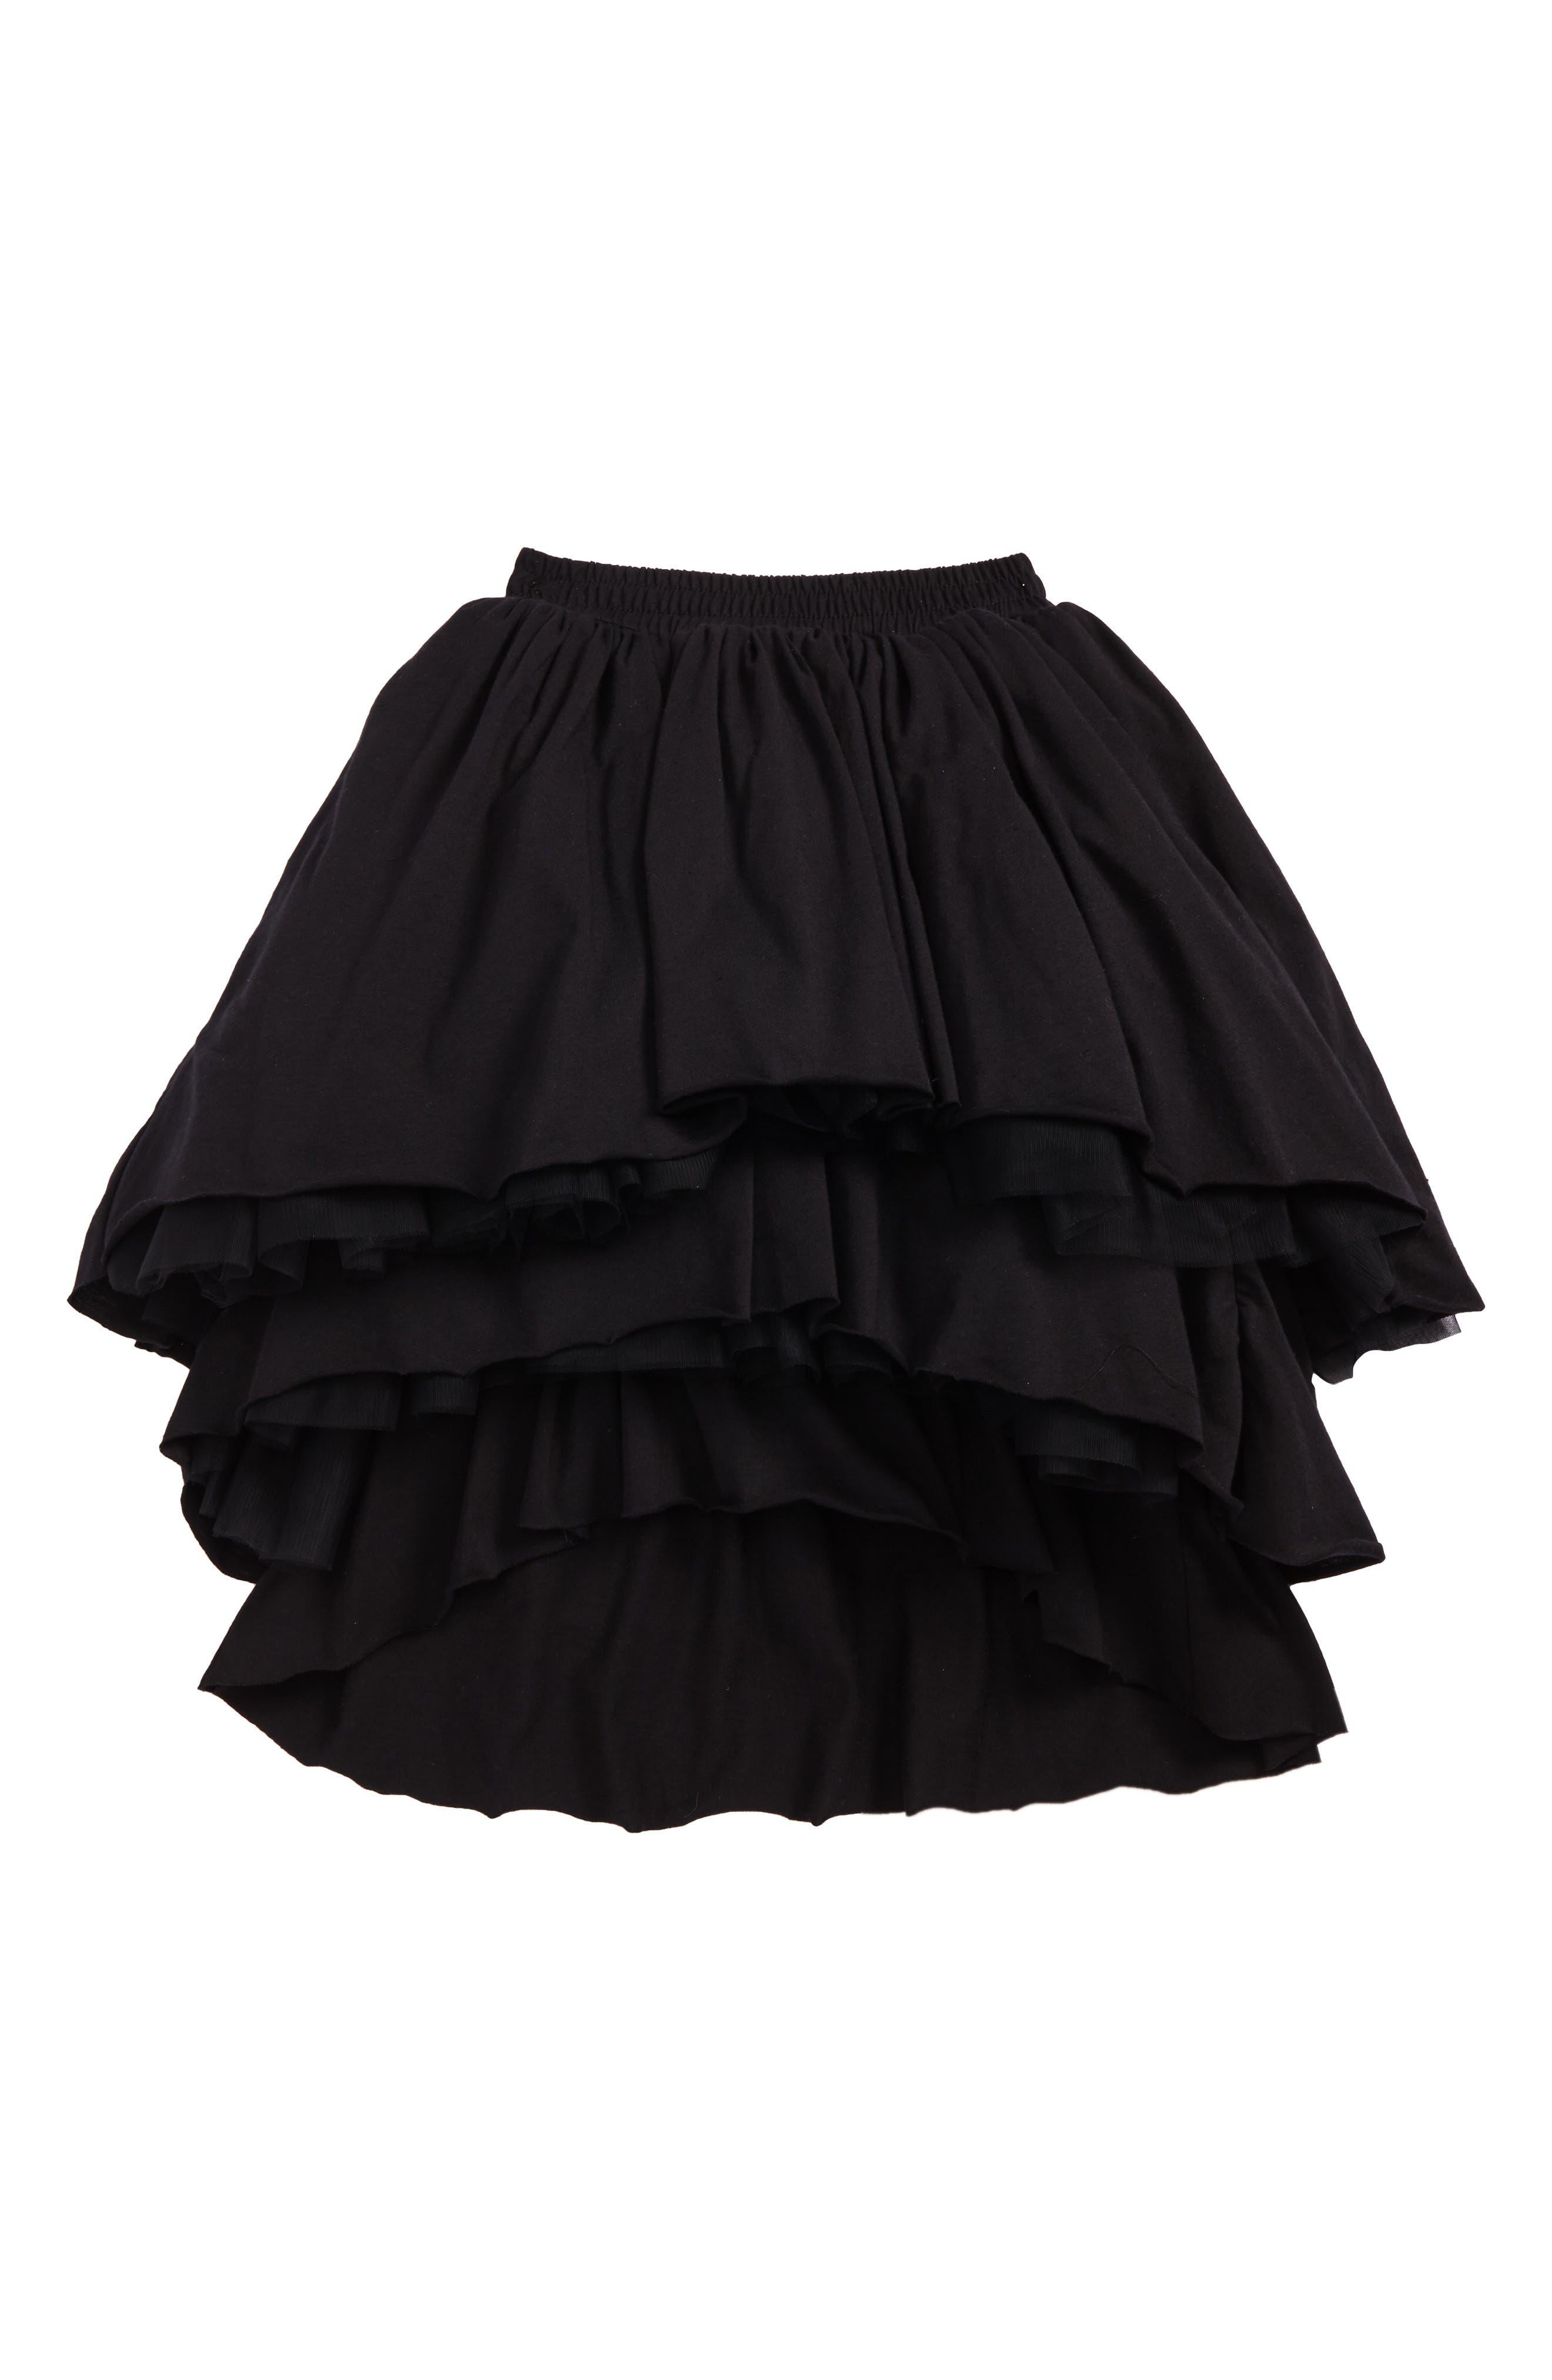 Main Image - Nununu Layered Tulle Skirt (Toddler Girls & Little Girls)